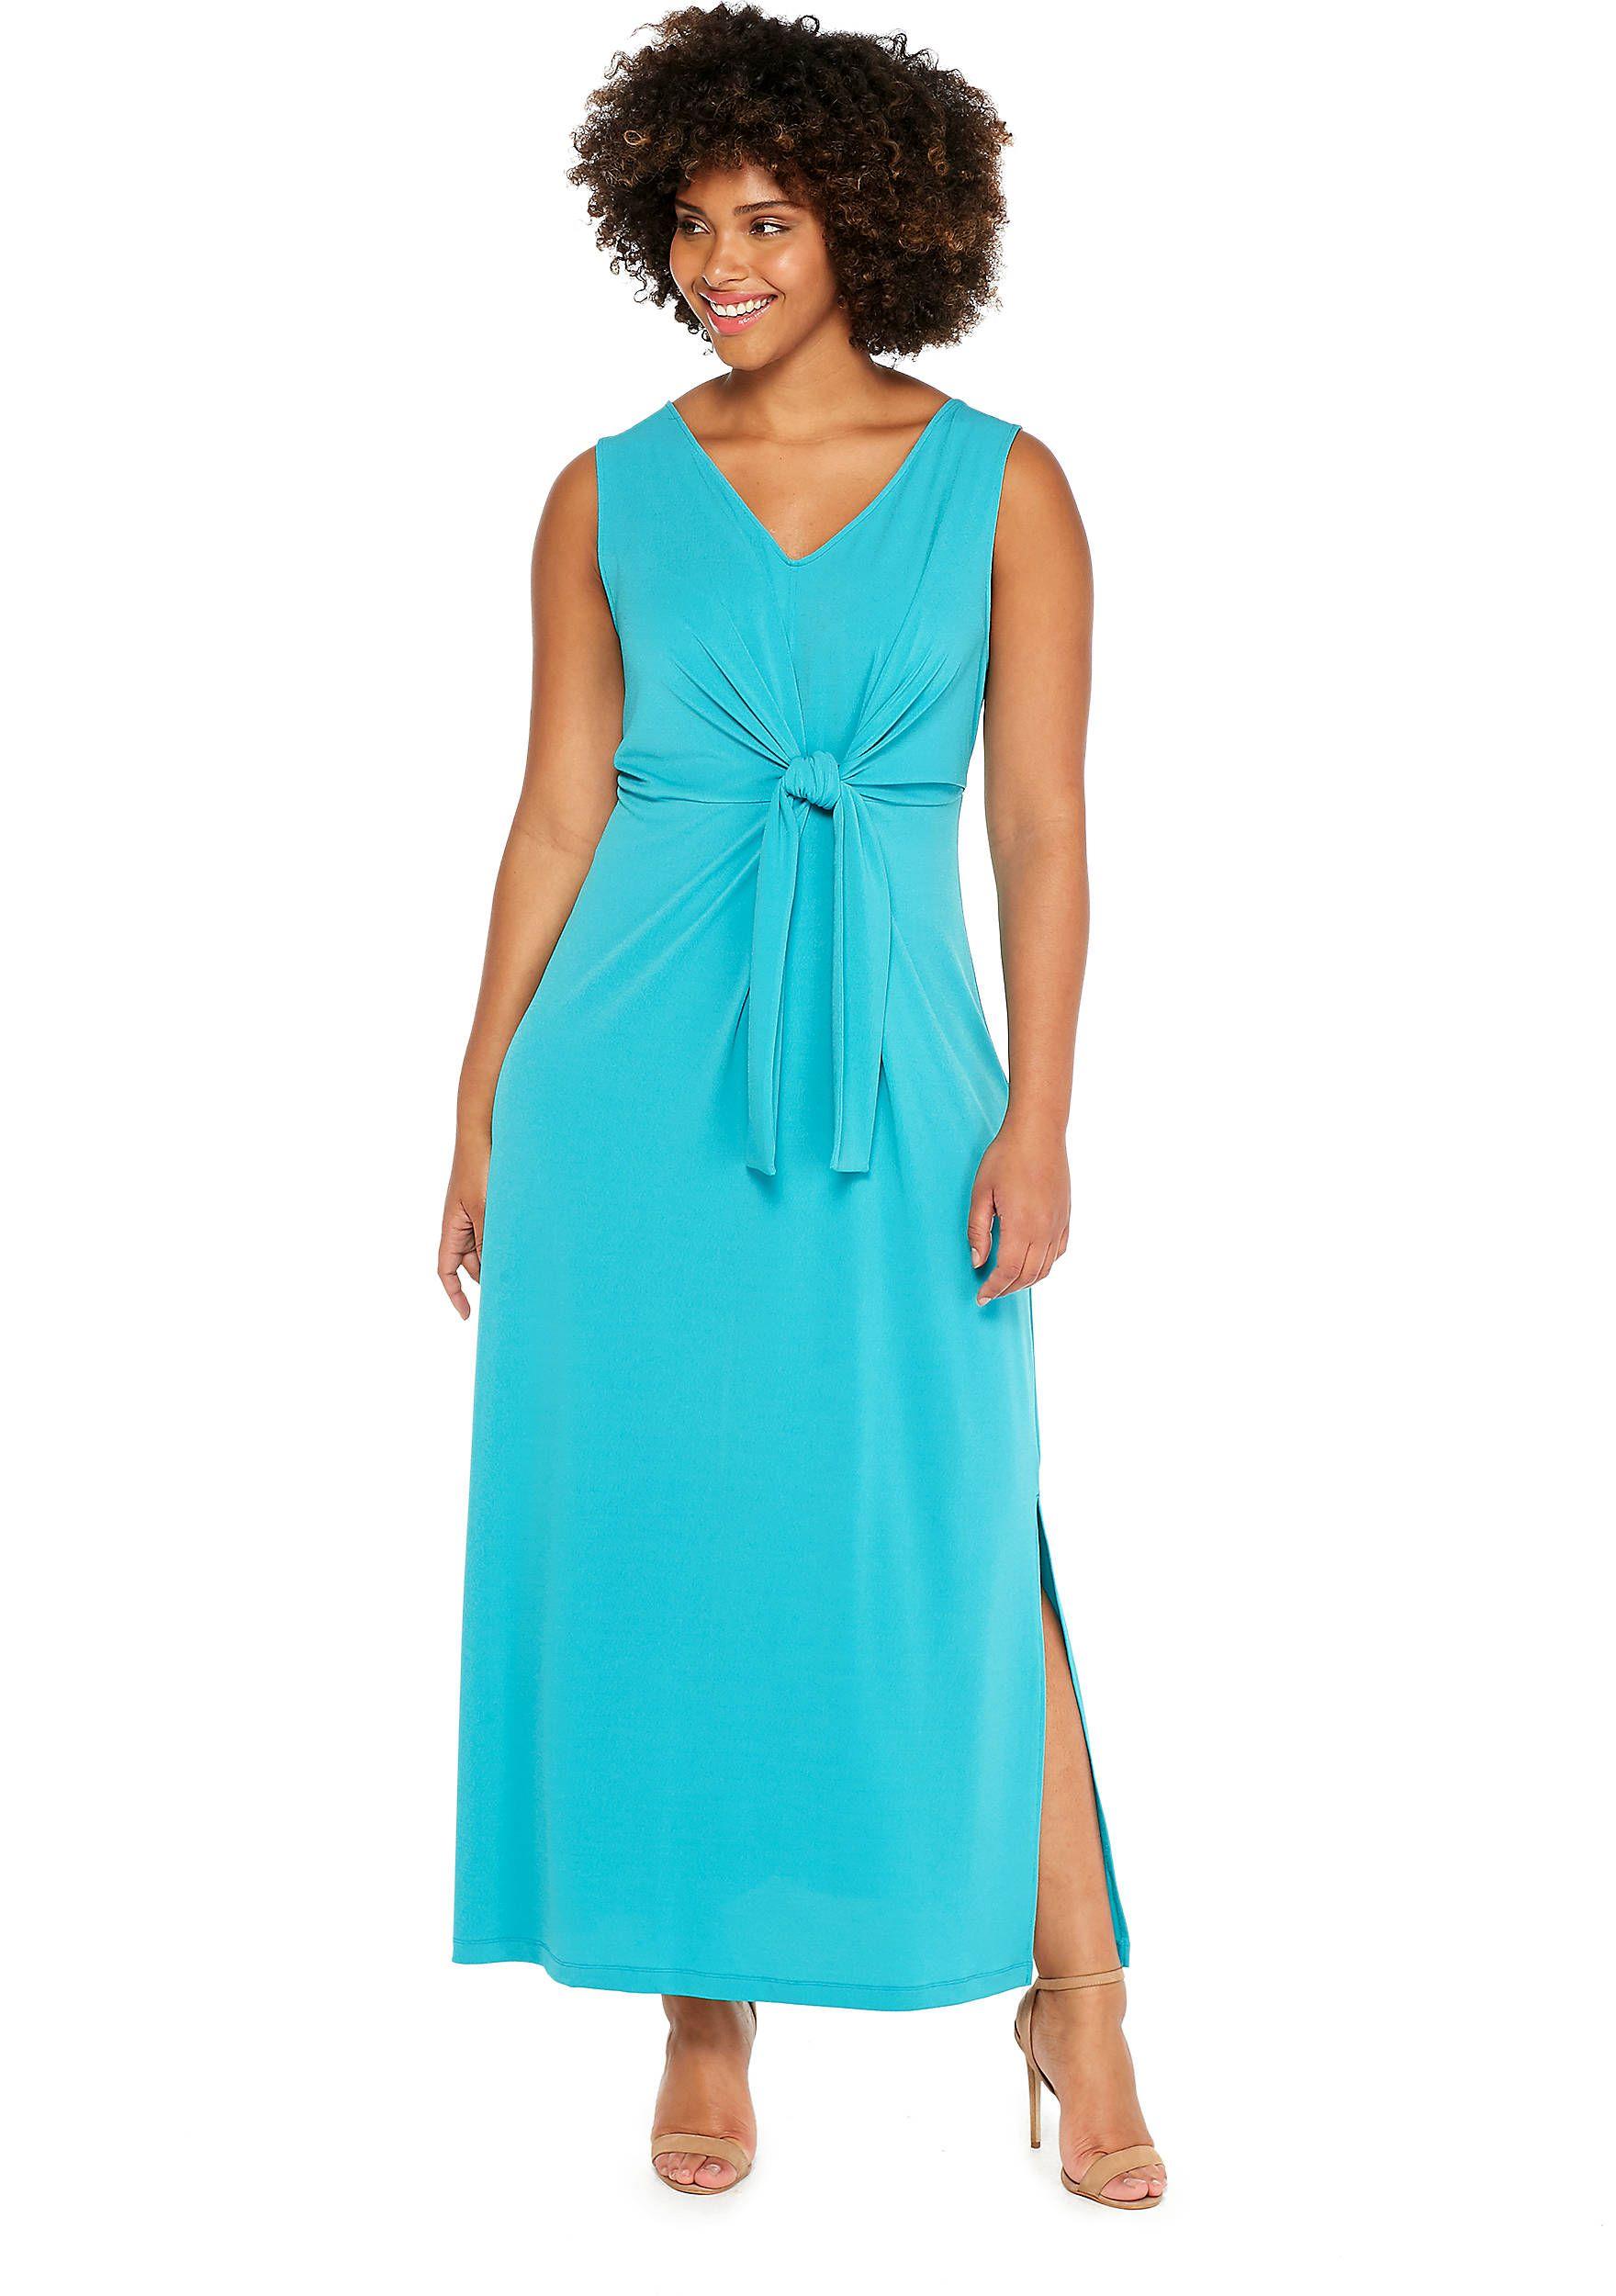 44b7739ef5f Plus Size Tie Front Halter Top High Low Dress